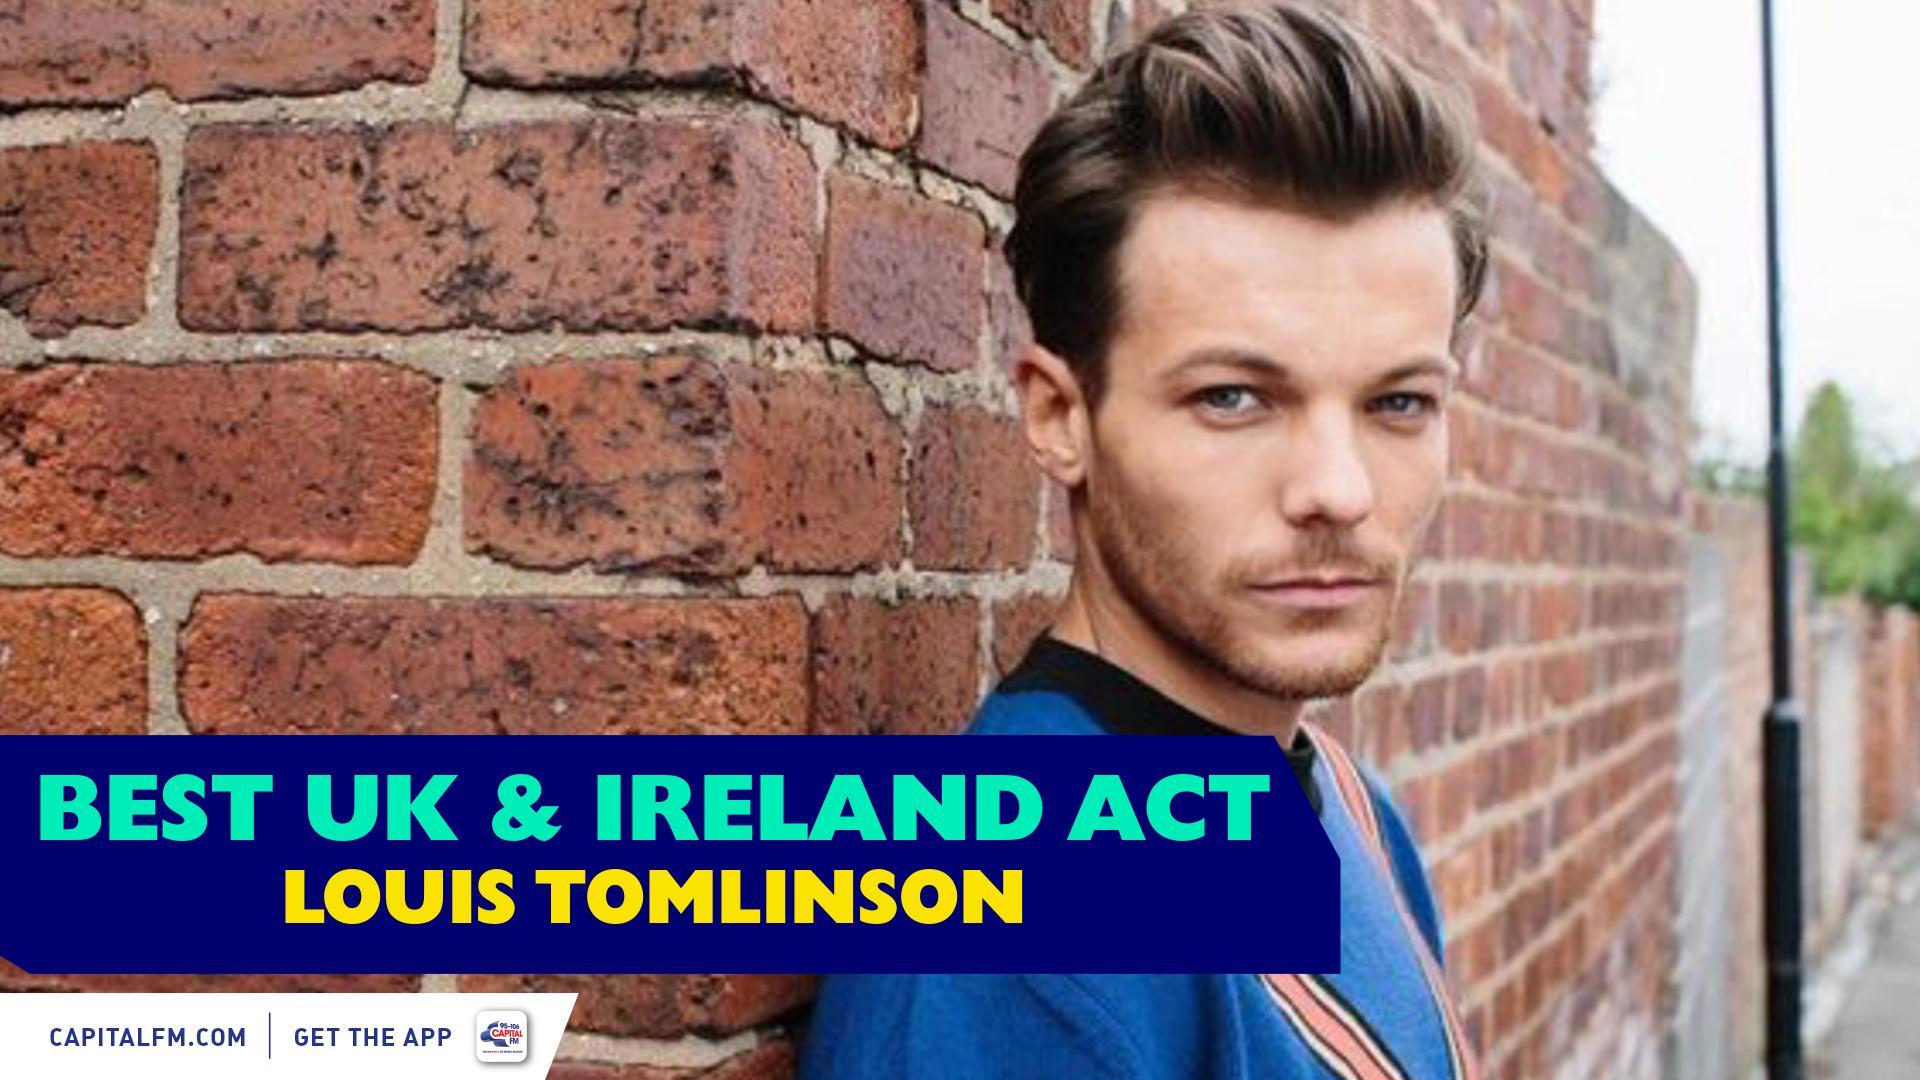 MTV EMAs - Best UK & Ireland Act